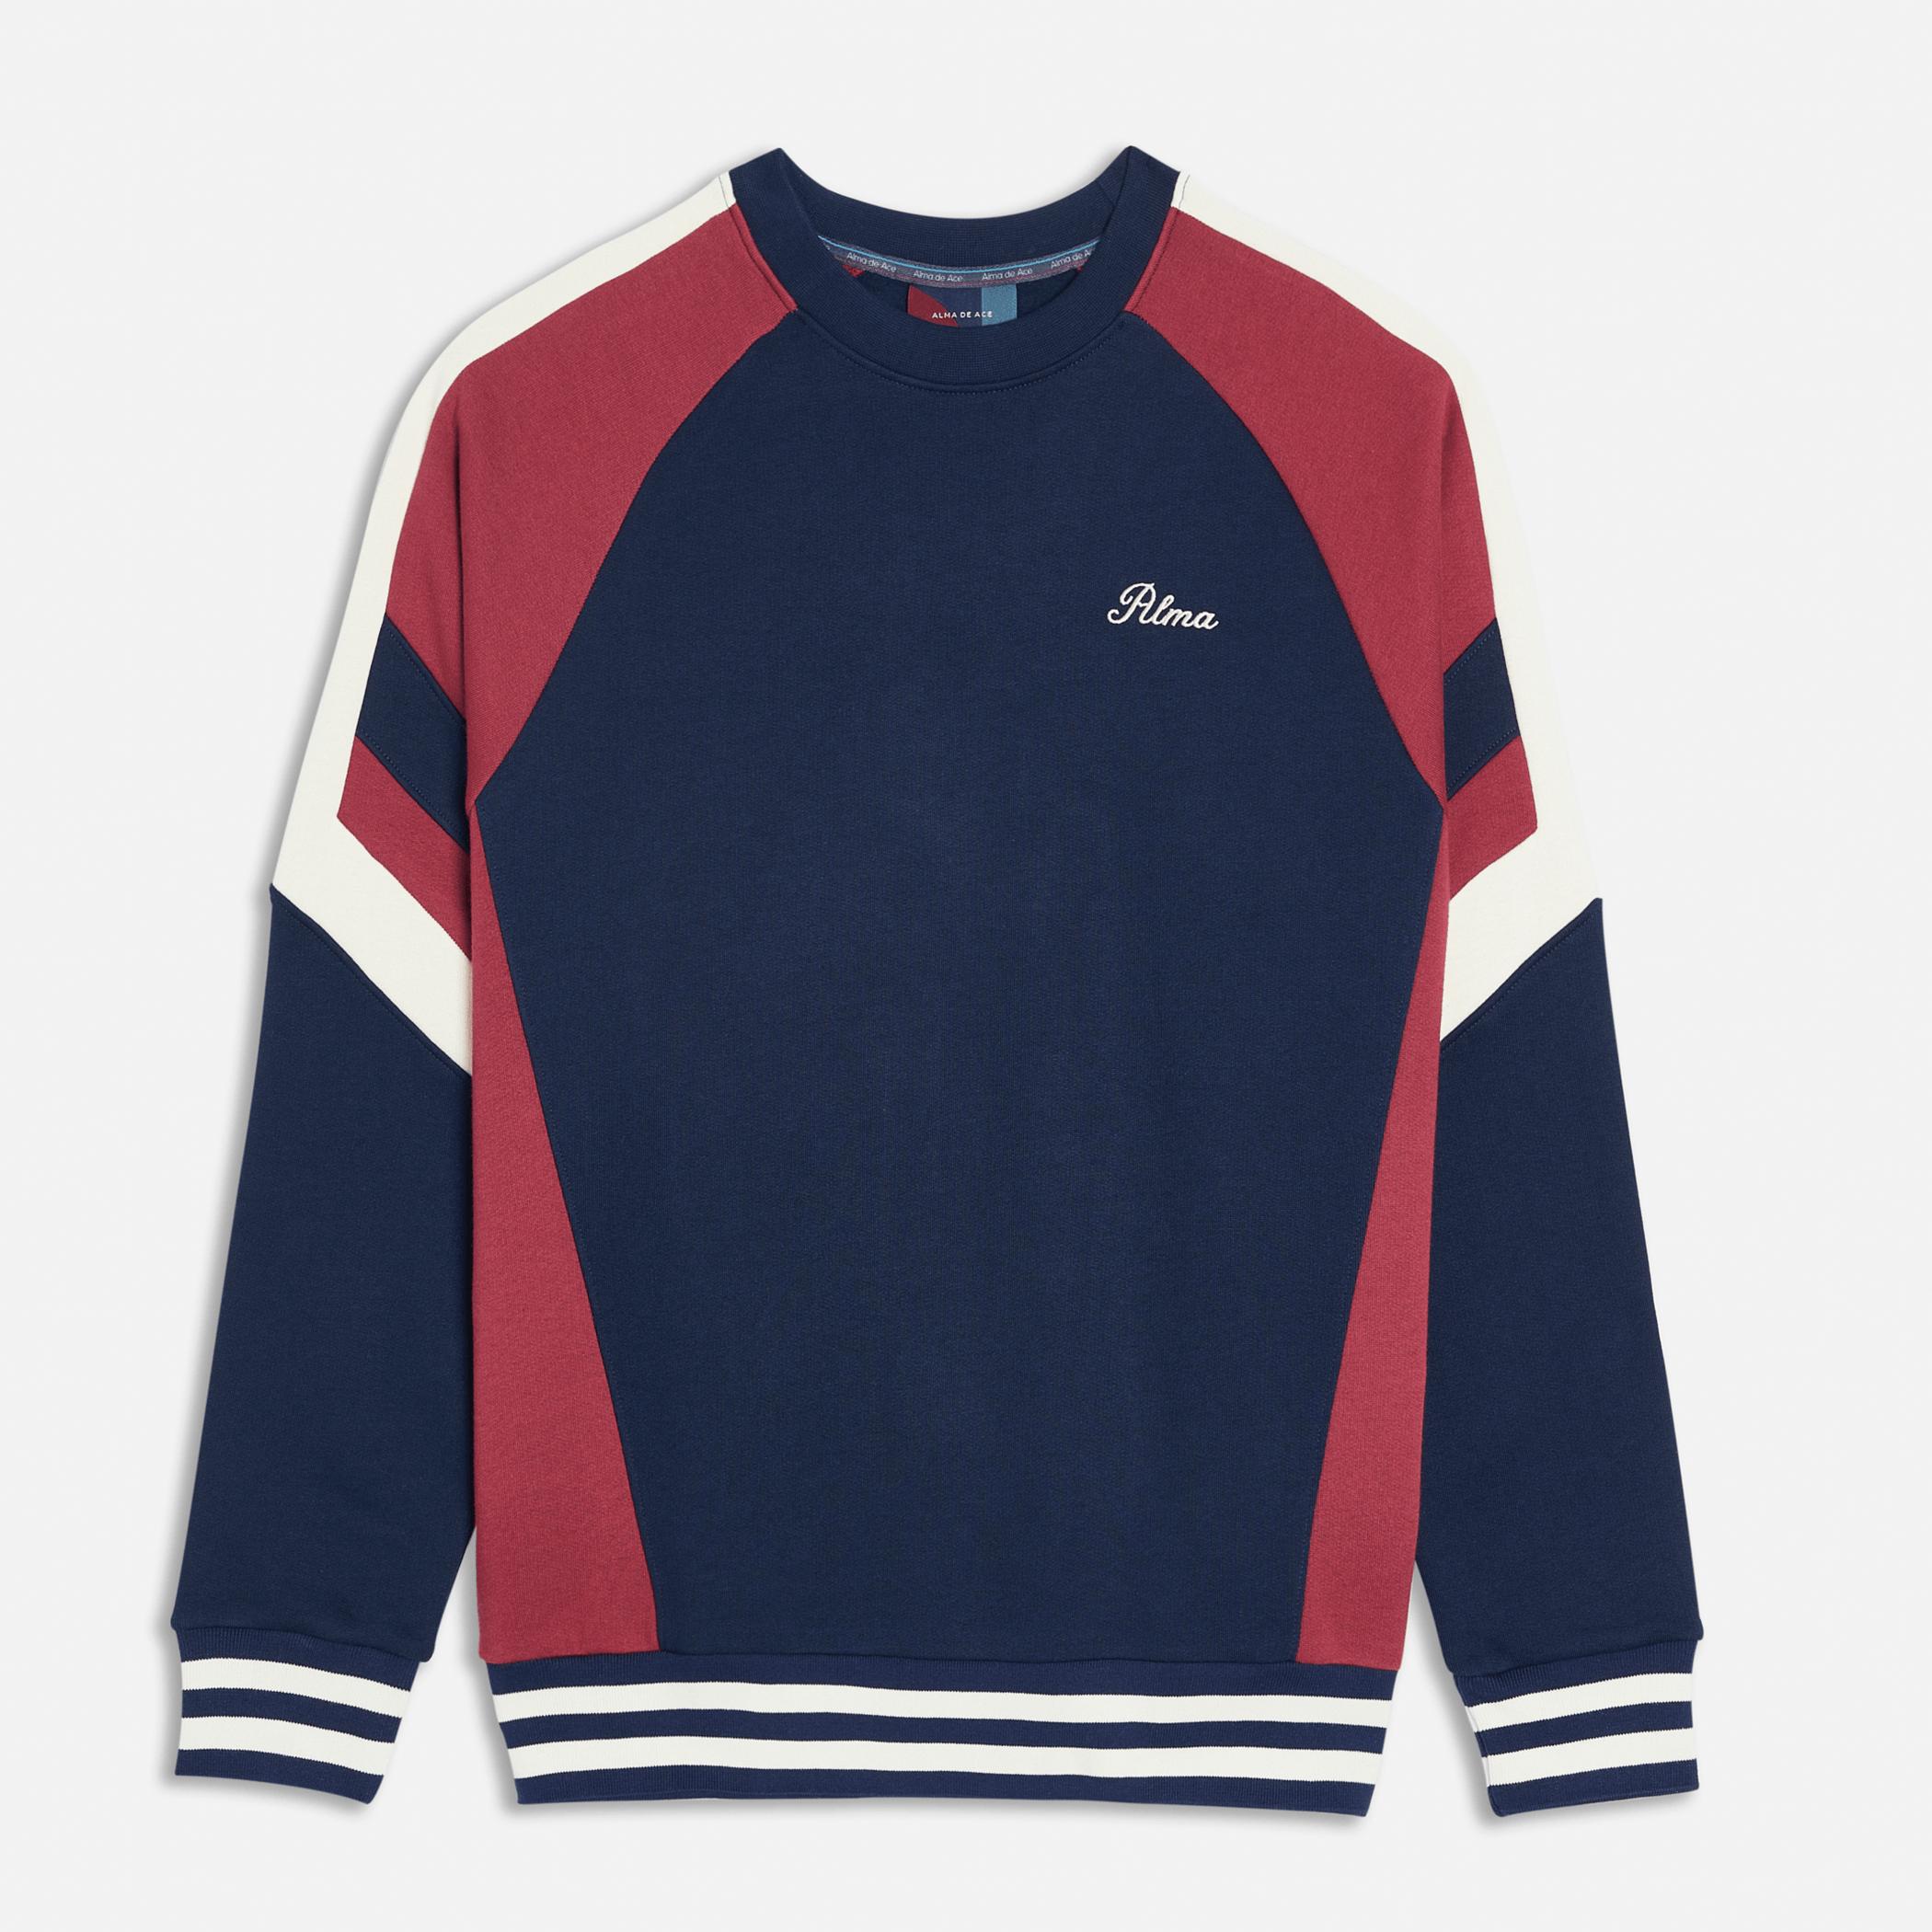 Navy Burgundy Peli Sweatshirt